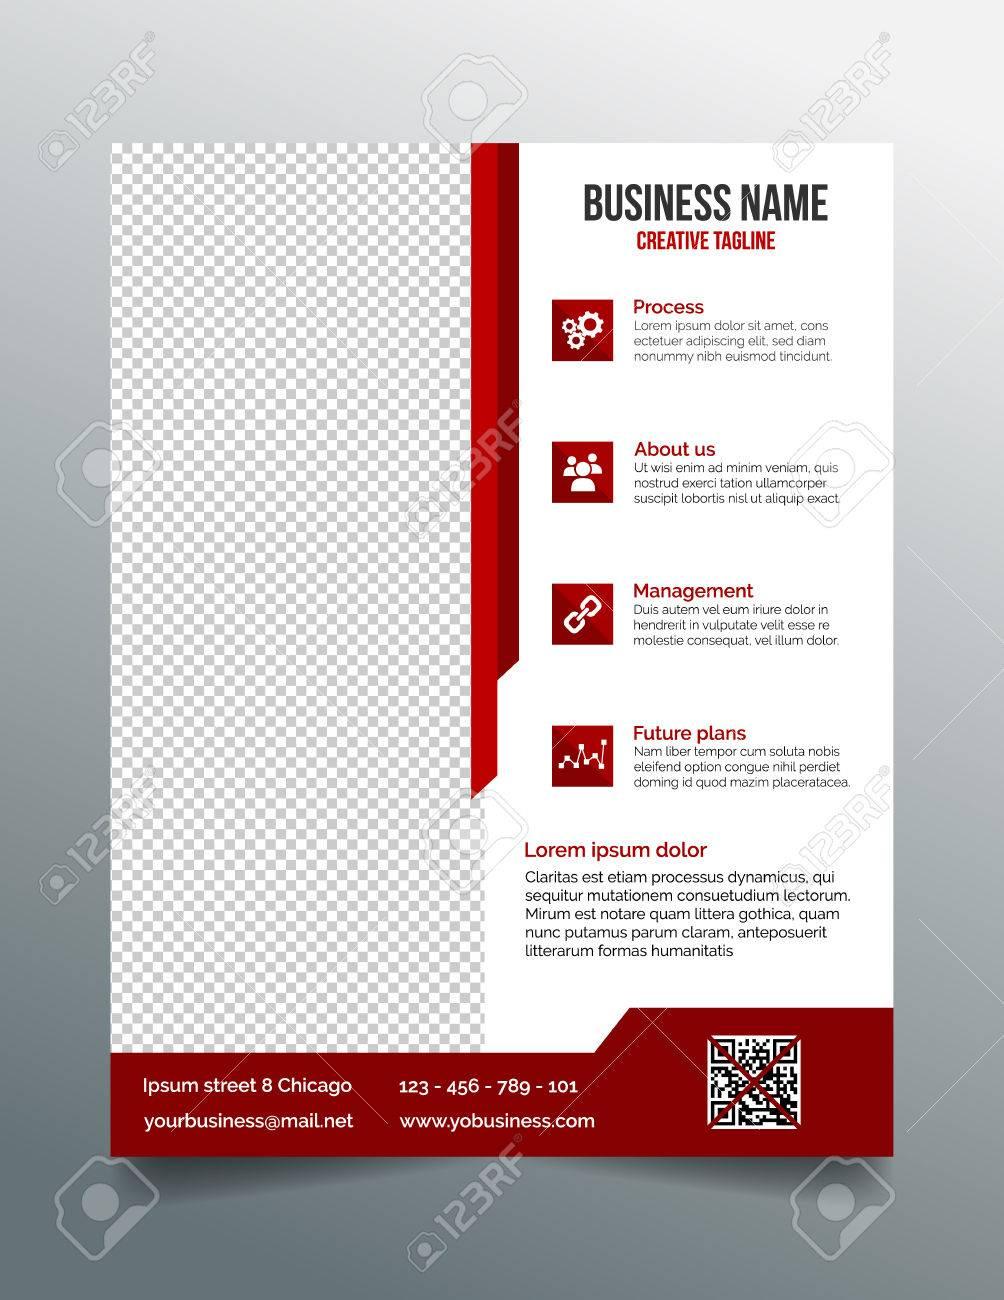 corporate business flyer template in modern sleek design royalty